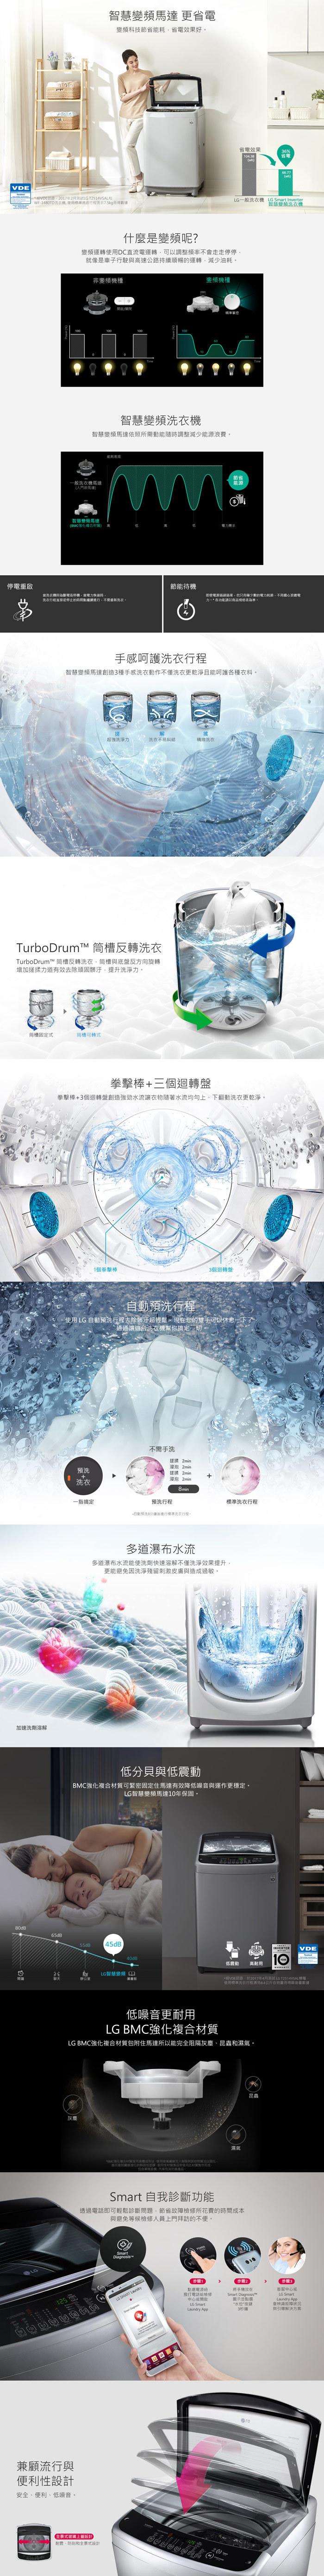 LG 樂金 WT-ID137SG 洗衣機 13kg 智慧變頻馬達10年保固